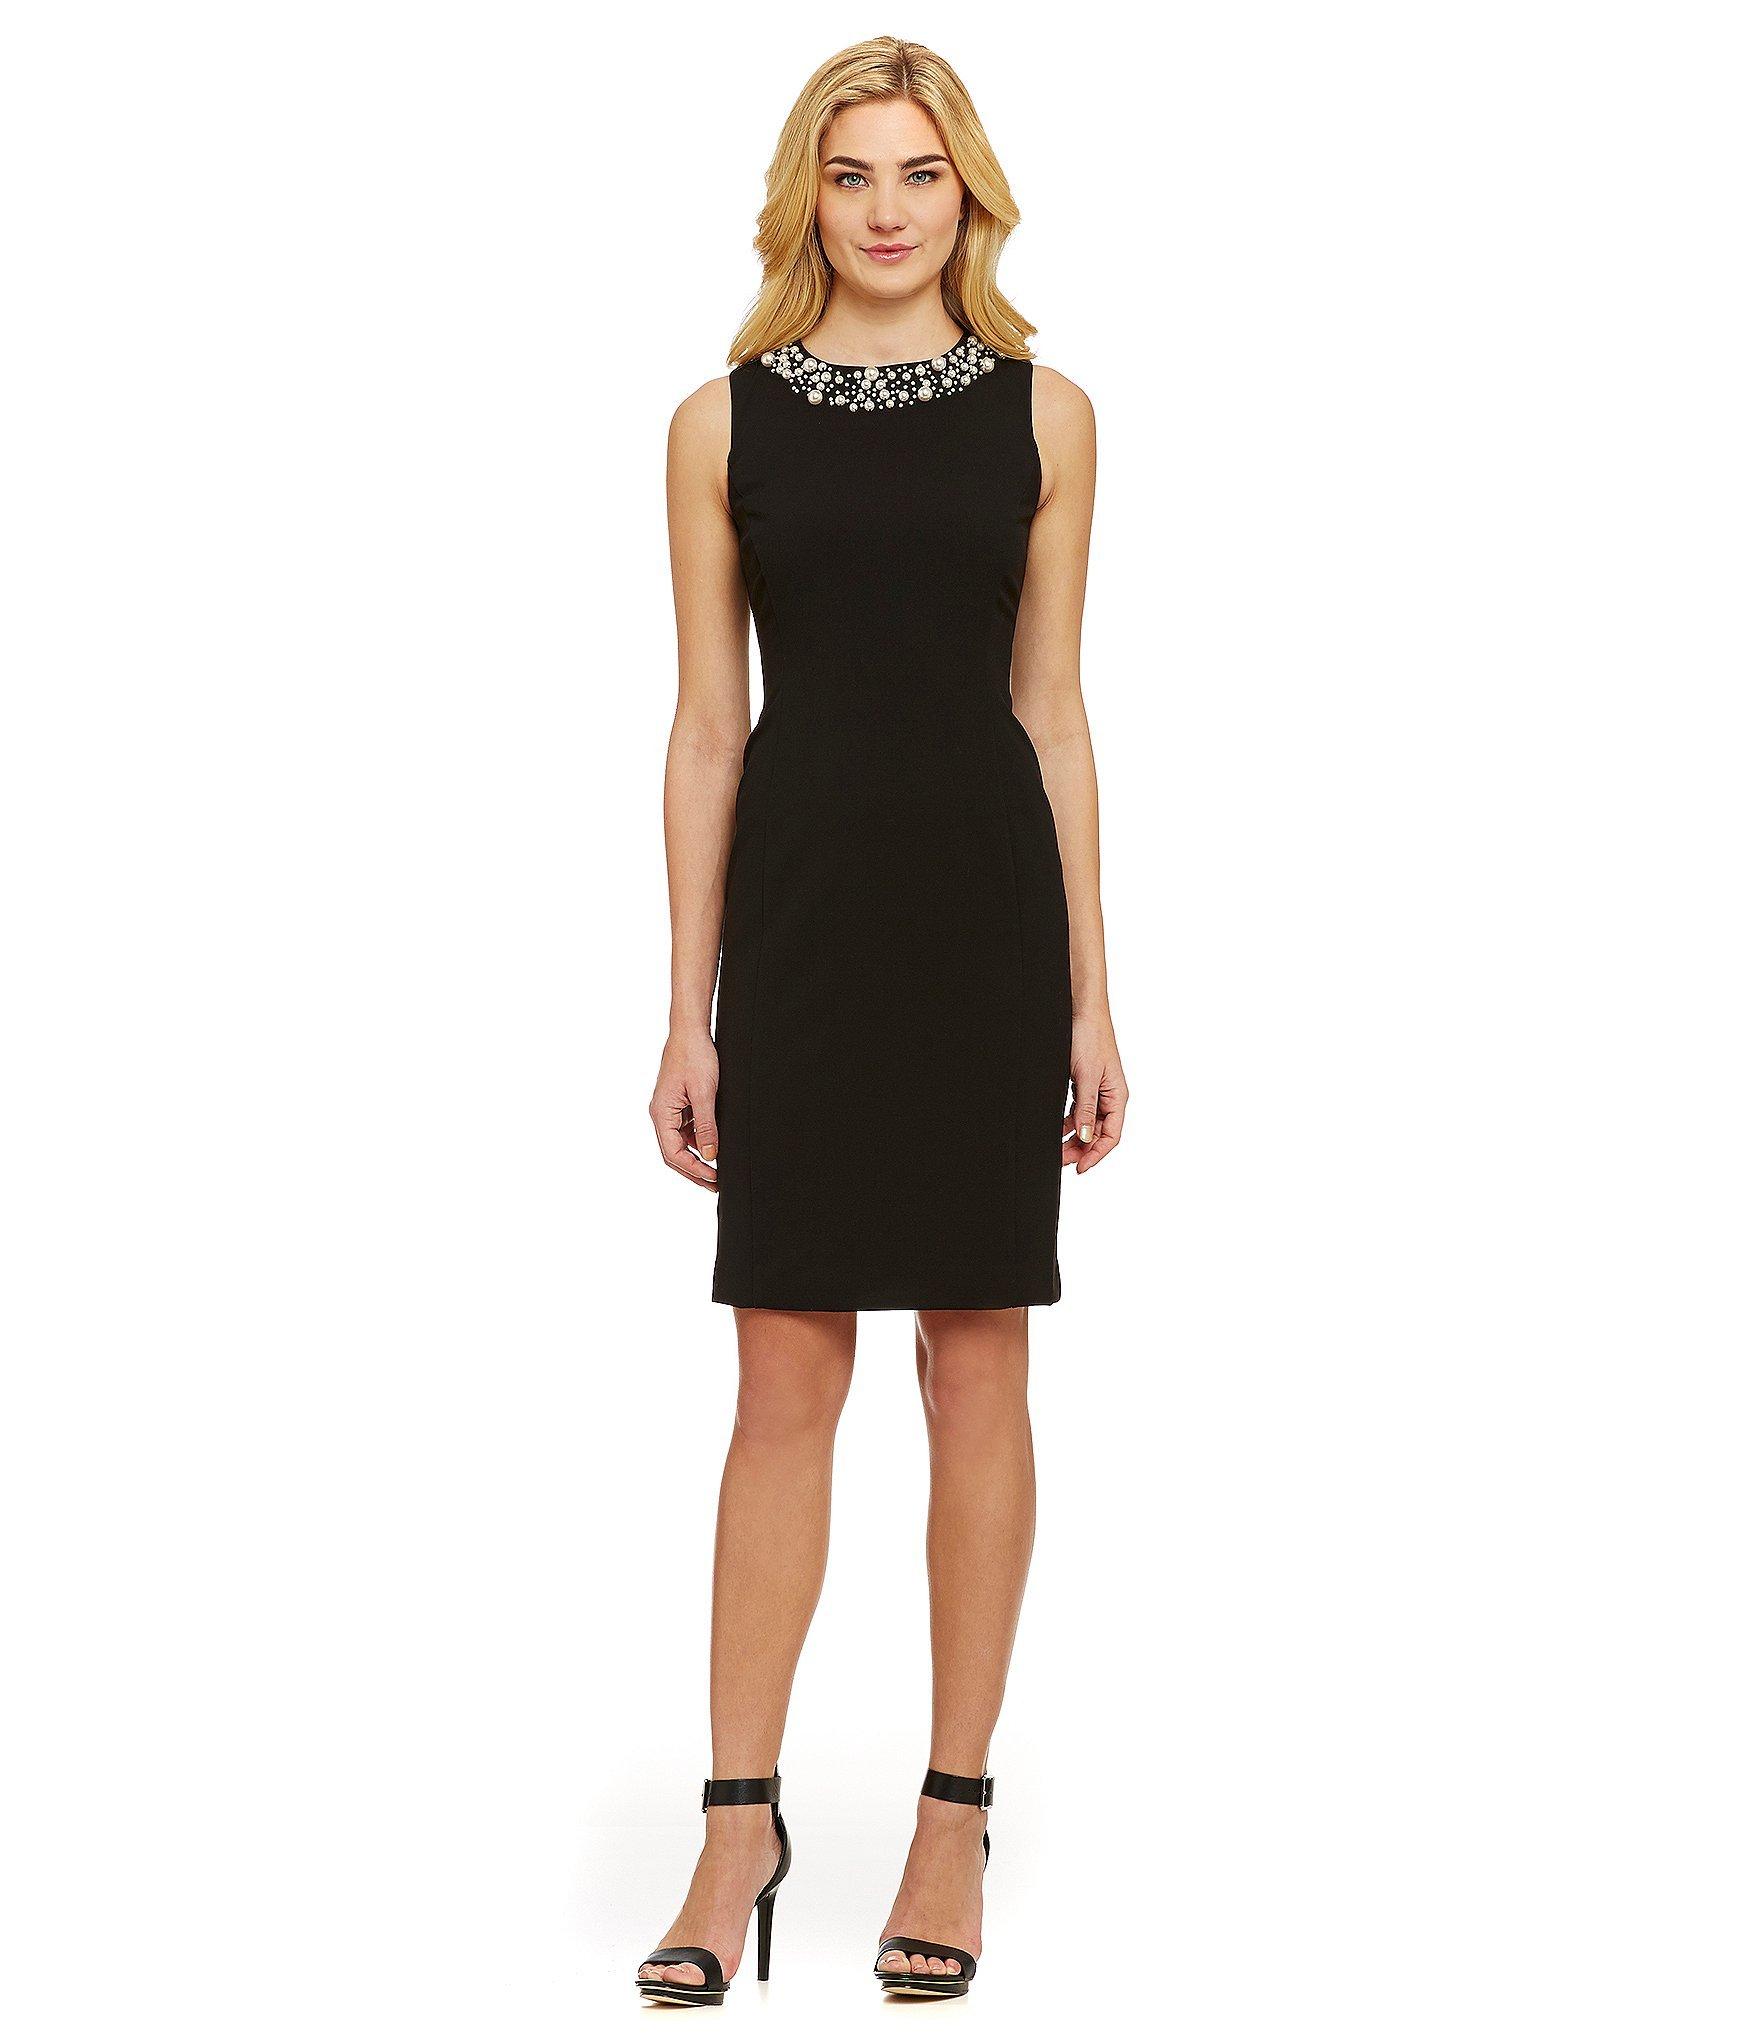 Calvin Klein Women S Black Beaded Sleeveless Wear To Work Dress